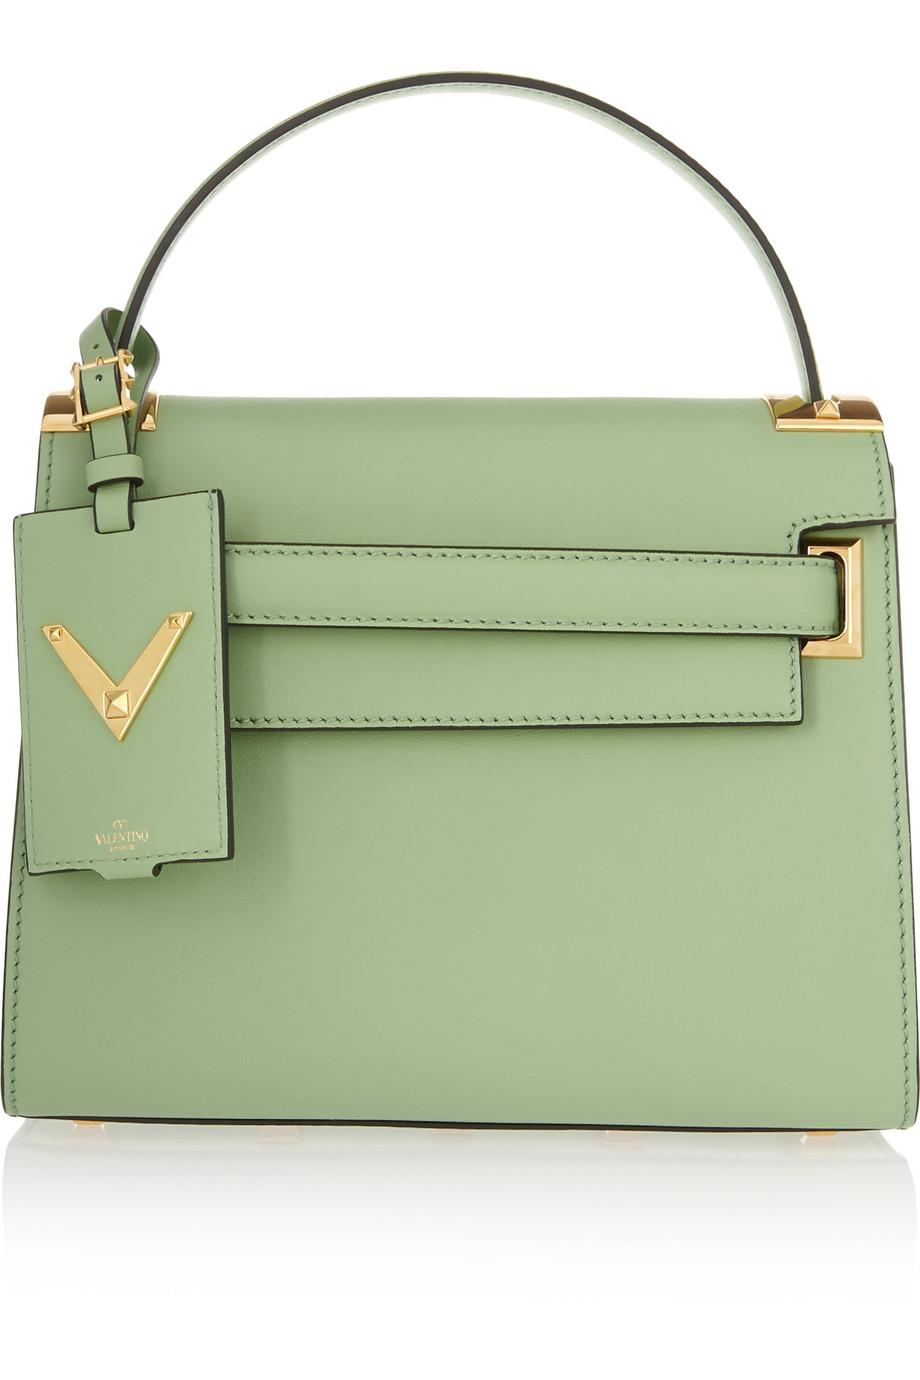 Valentino My Rockstud Leather Tote, Mint, Women's